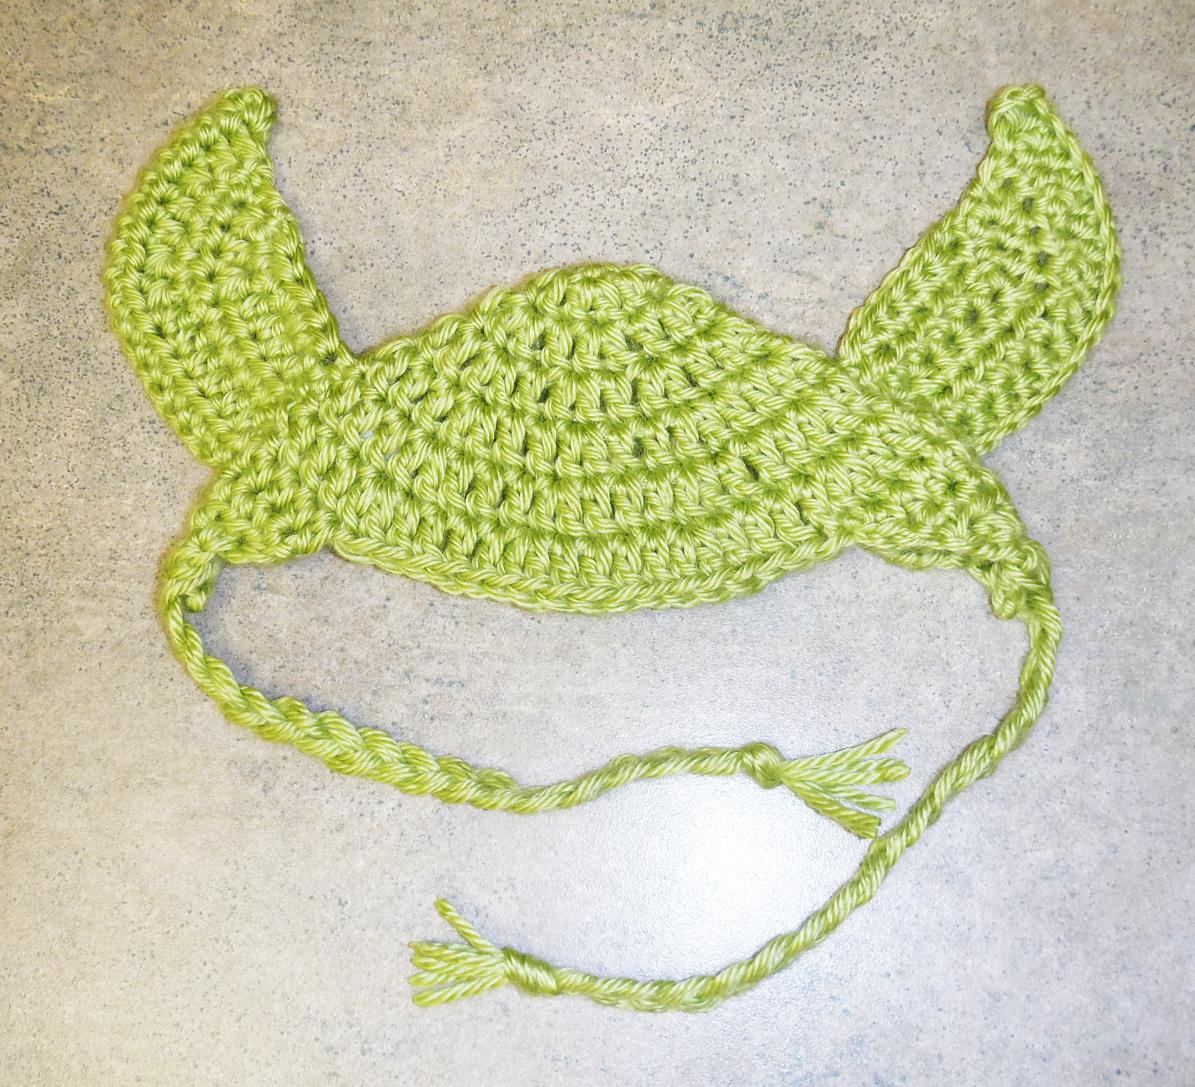 Show and Tell Meg: My First Crochet Customers - Yoda Dog Hats